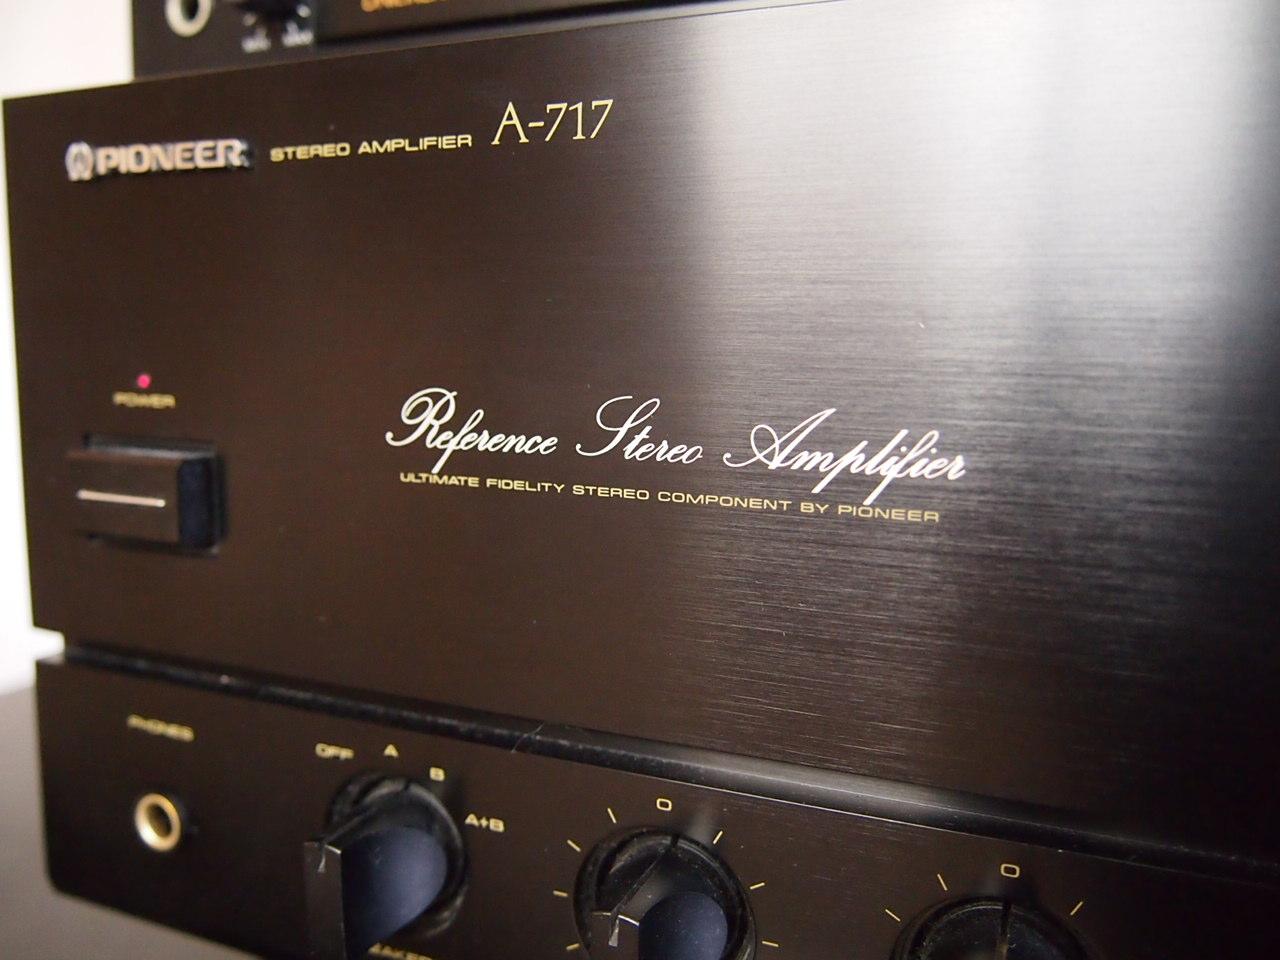 A-717 06